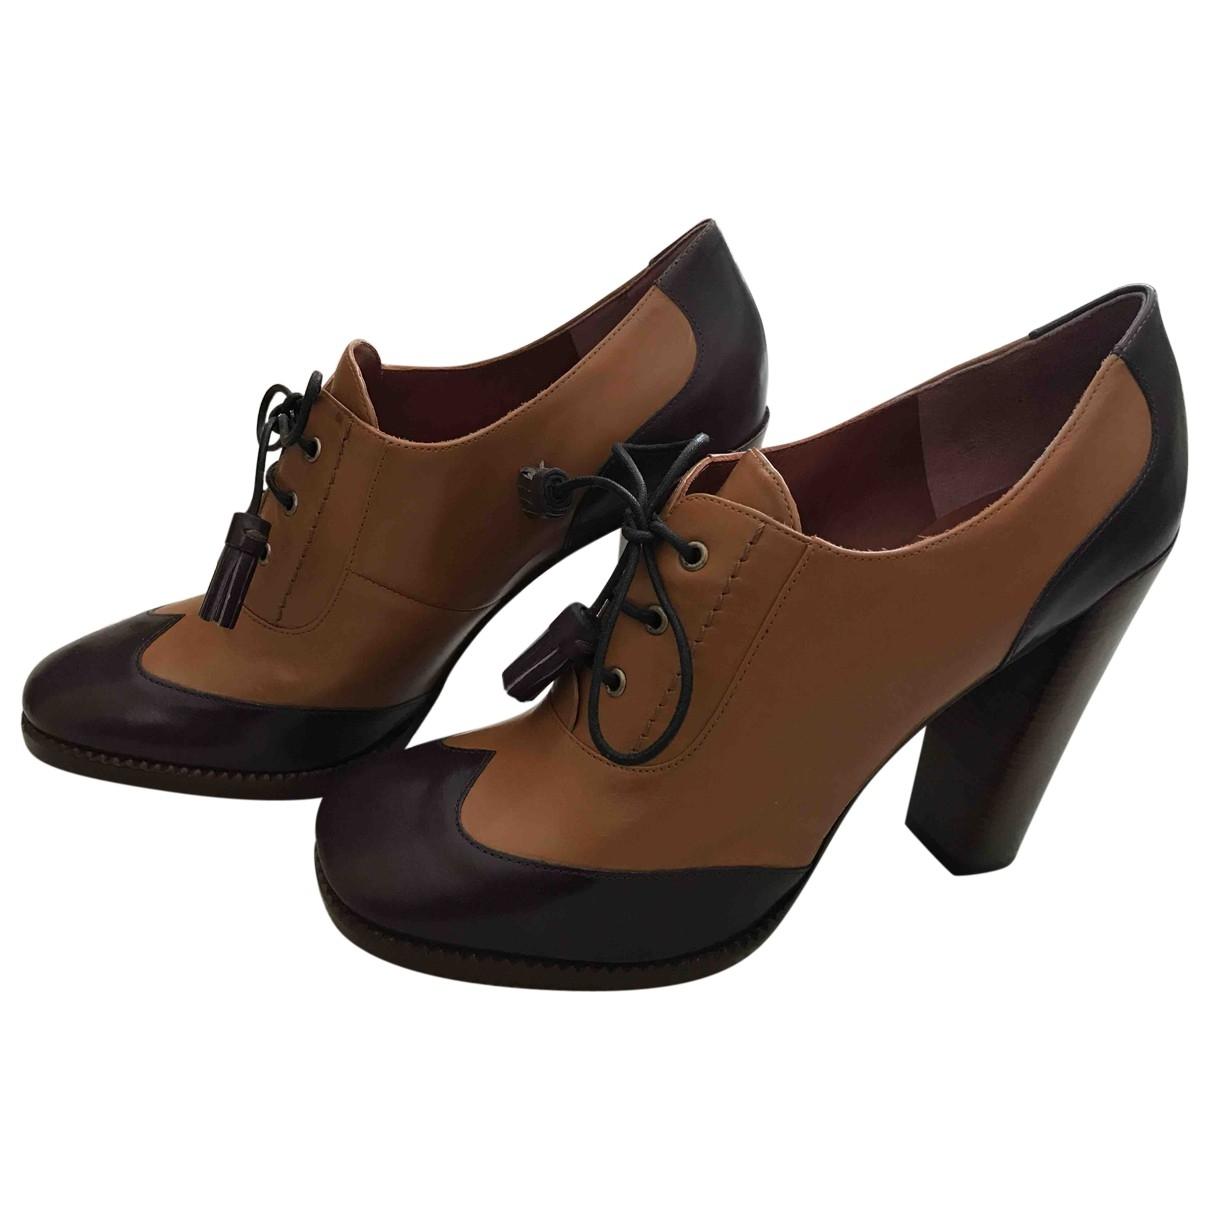 Marc By Marc Jacobs \N Beige Leather Heels for Women 40 EU